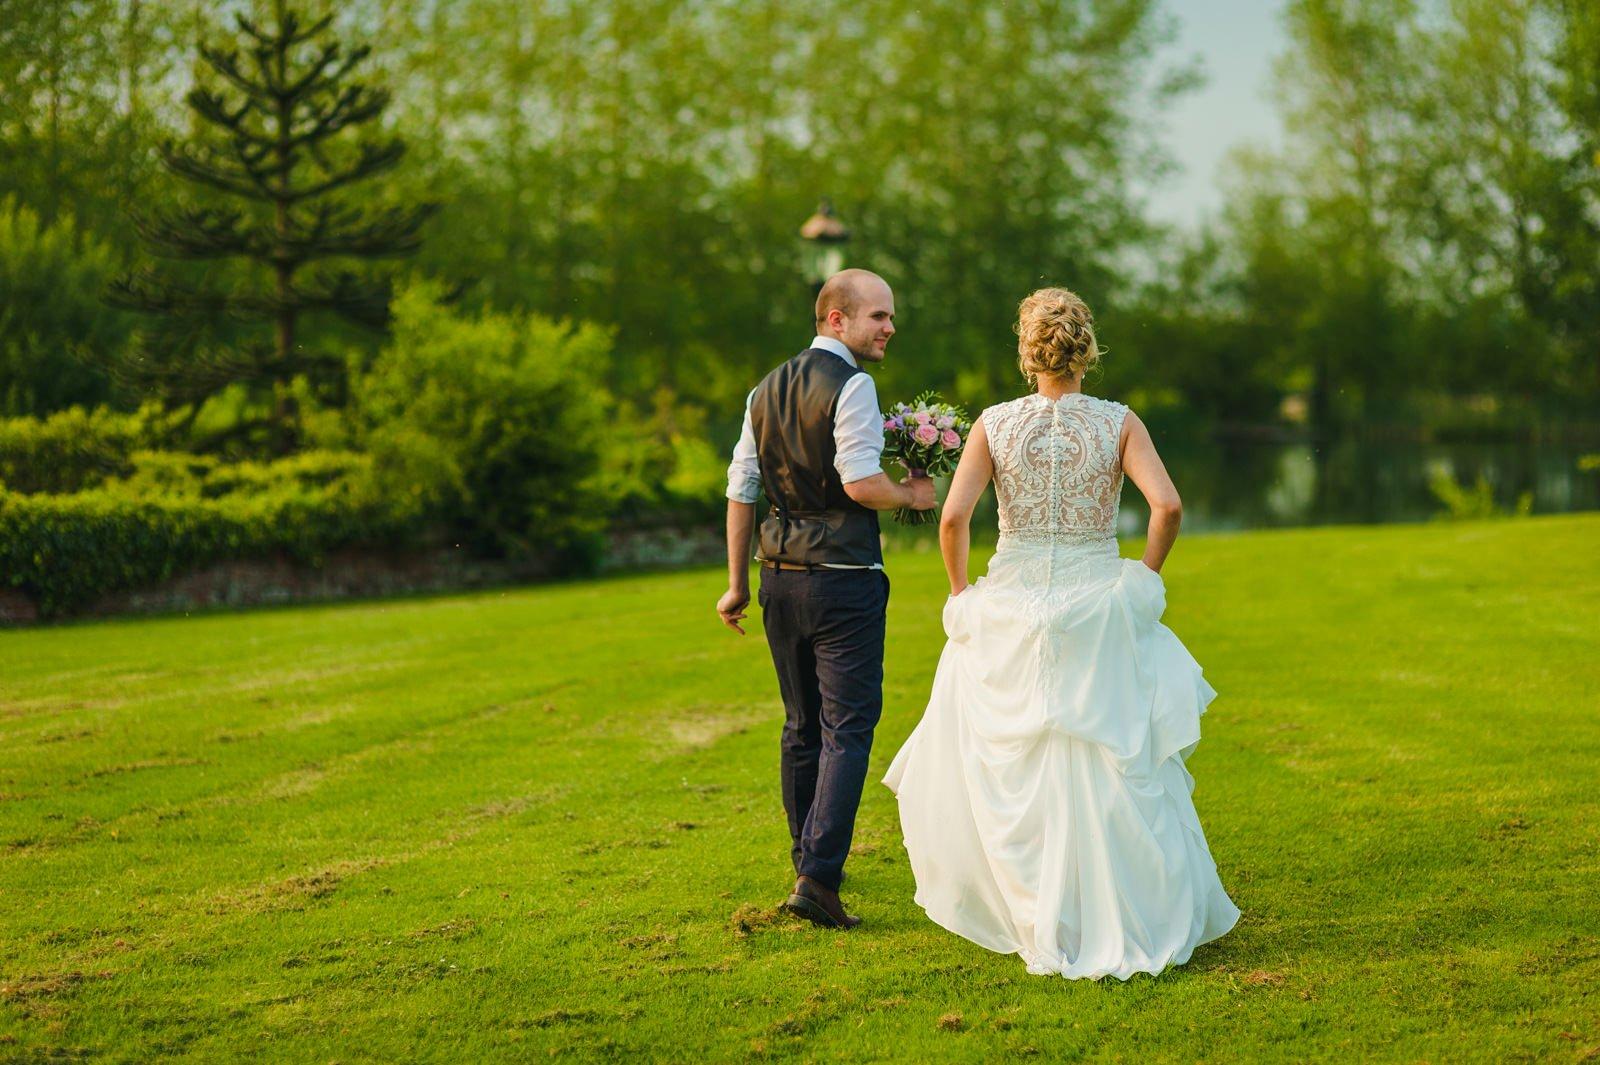 Millers Of Netley wedding, Dorrington, Shrewsbury | Emma + Ben 78